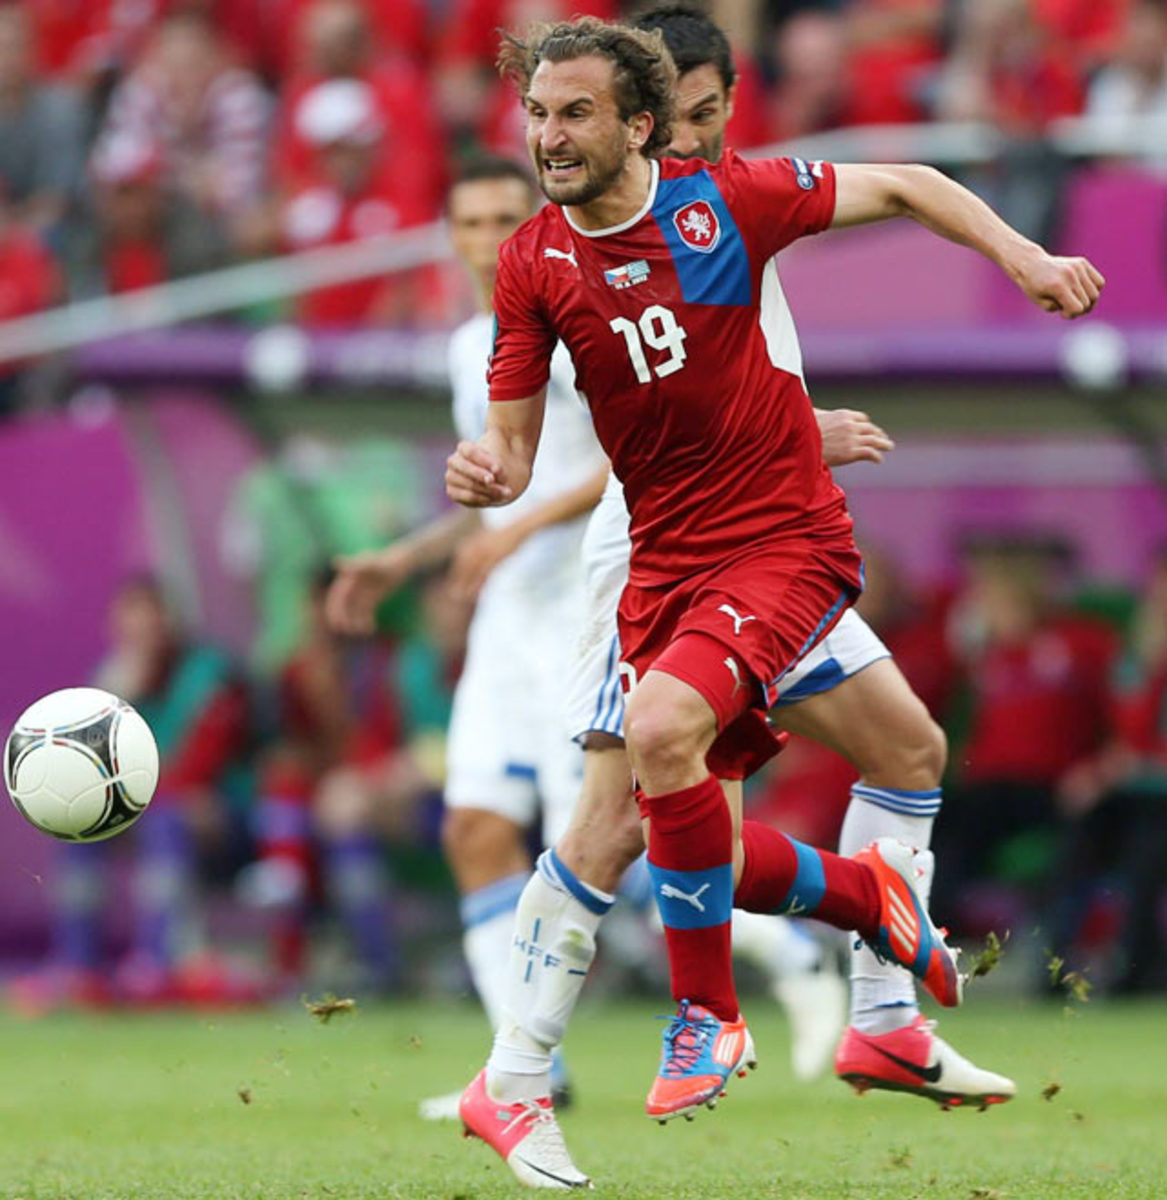 Czech Republic-Greece (2-1)